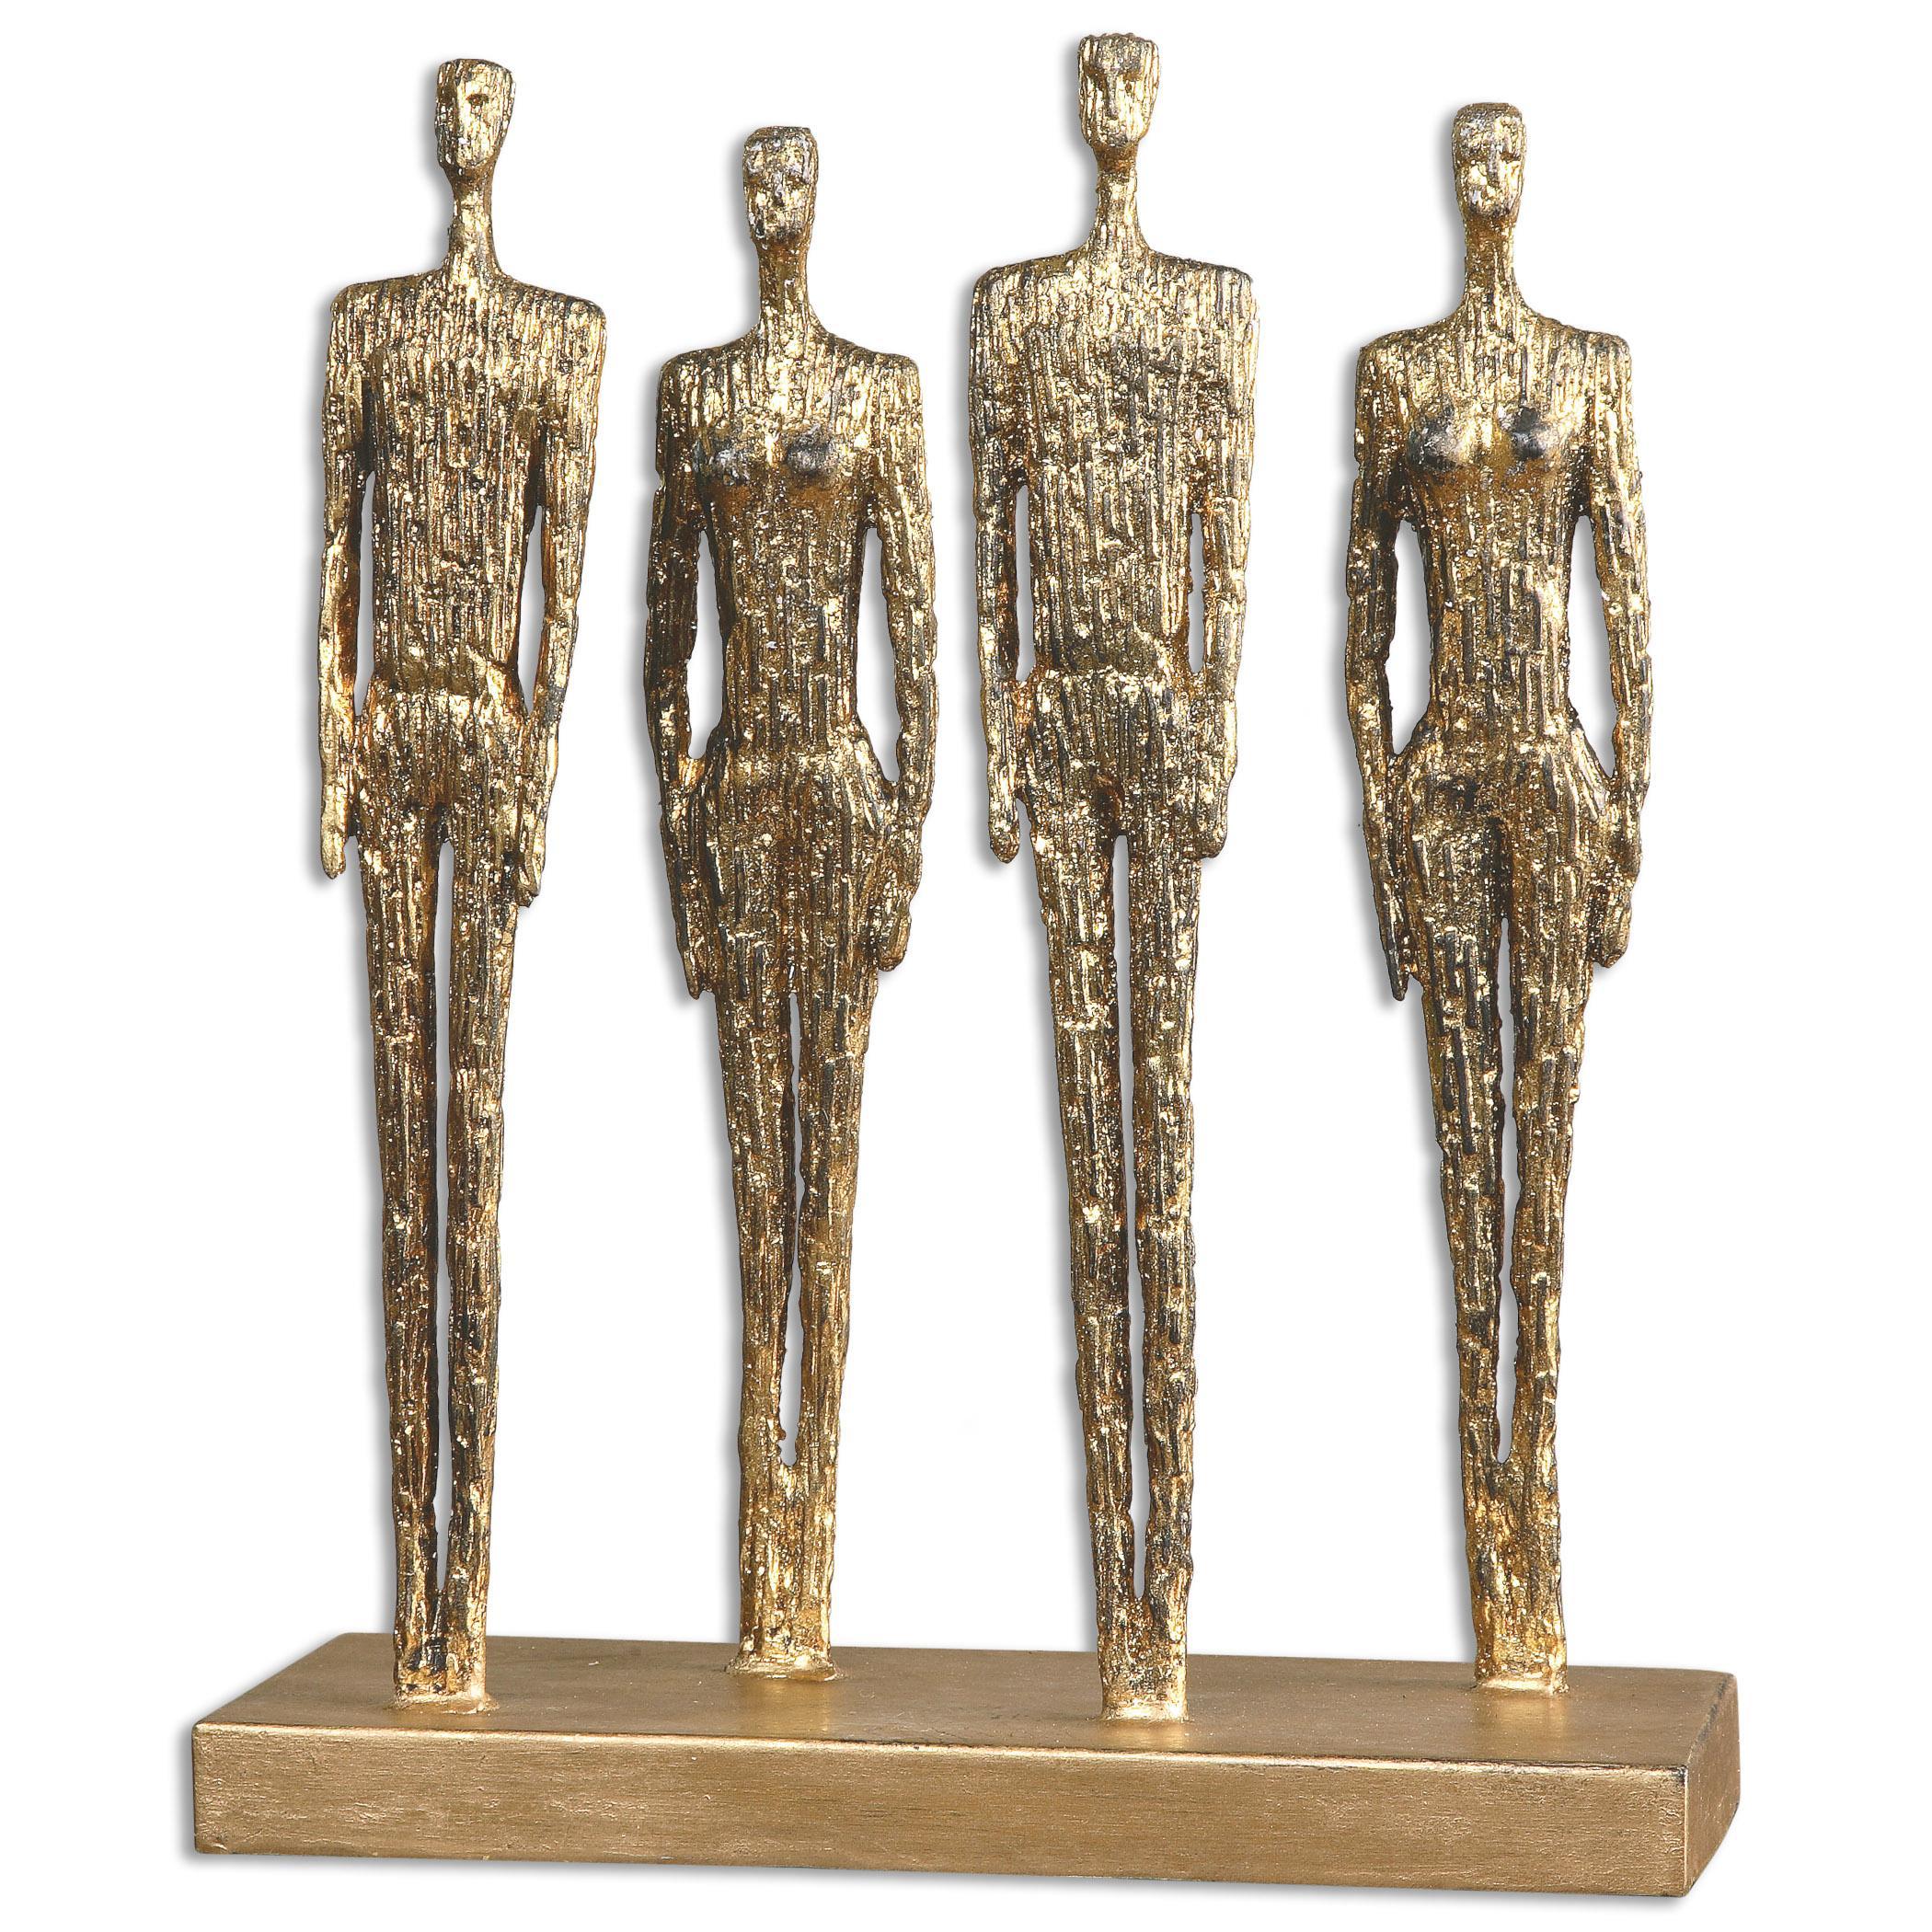 Uttermost Accessories Ten-hut Gold Sculpture - Item Number: 19884